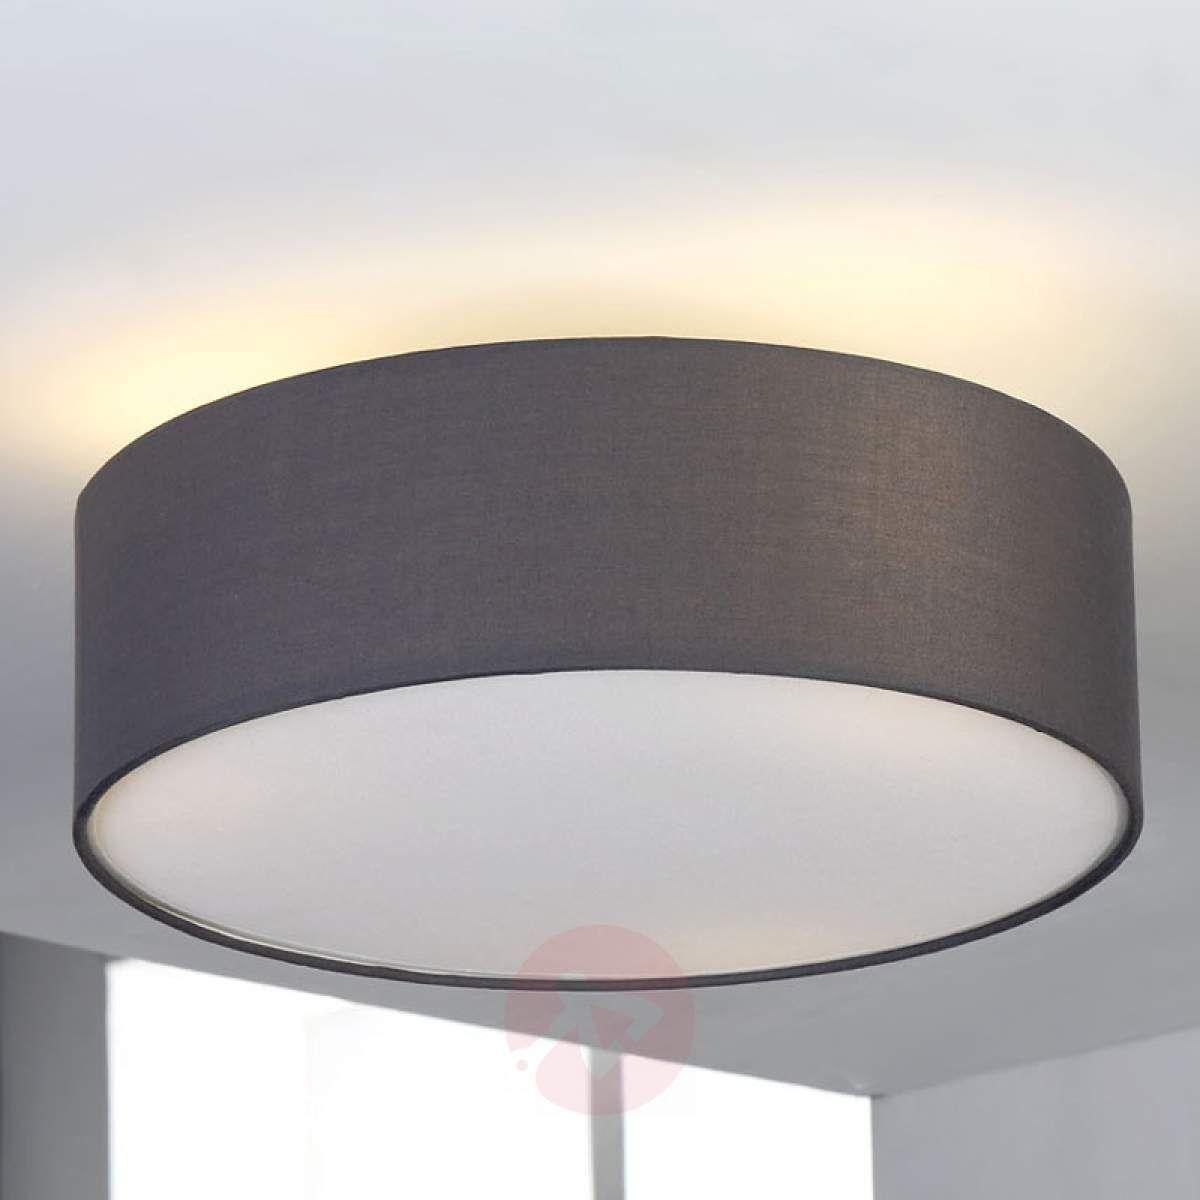 Jasnoszara Lampa Sufitowa Sebatin Z Materiału Lampy